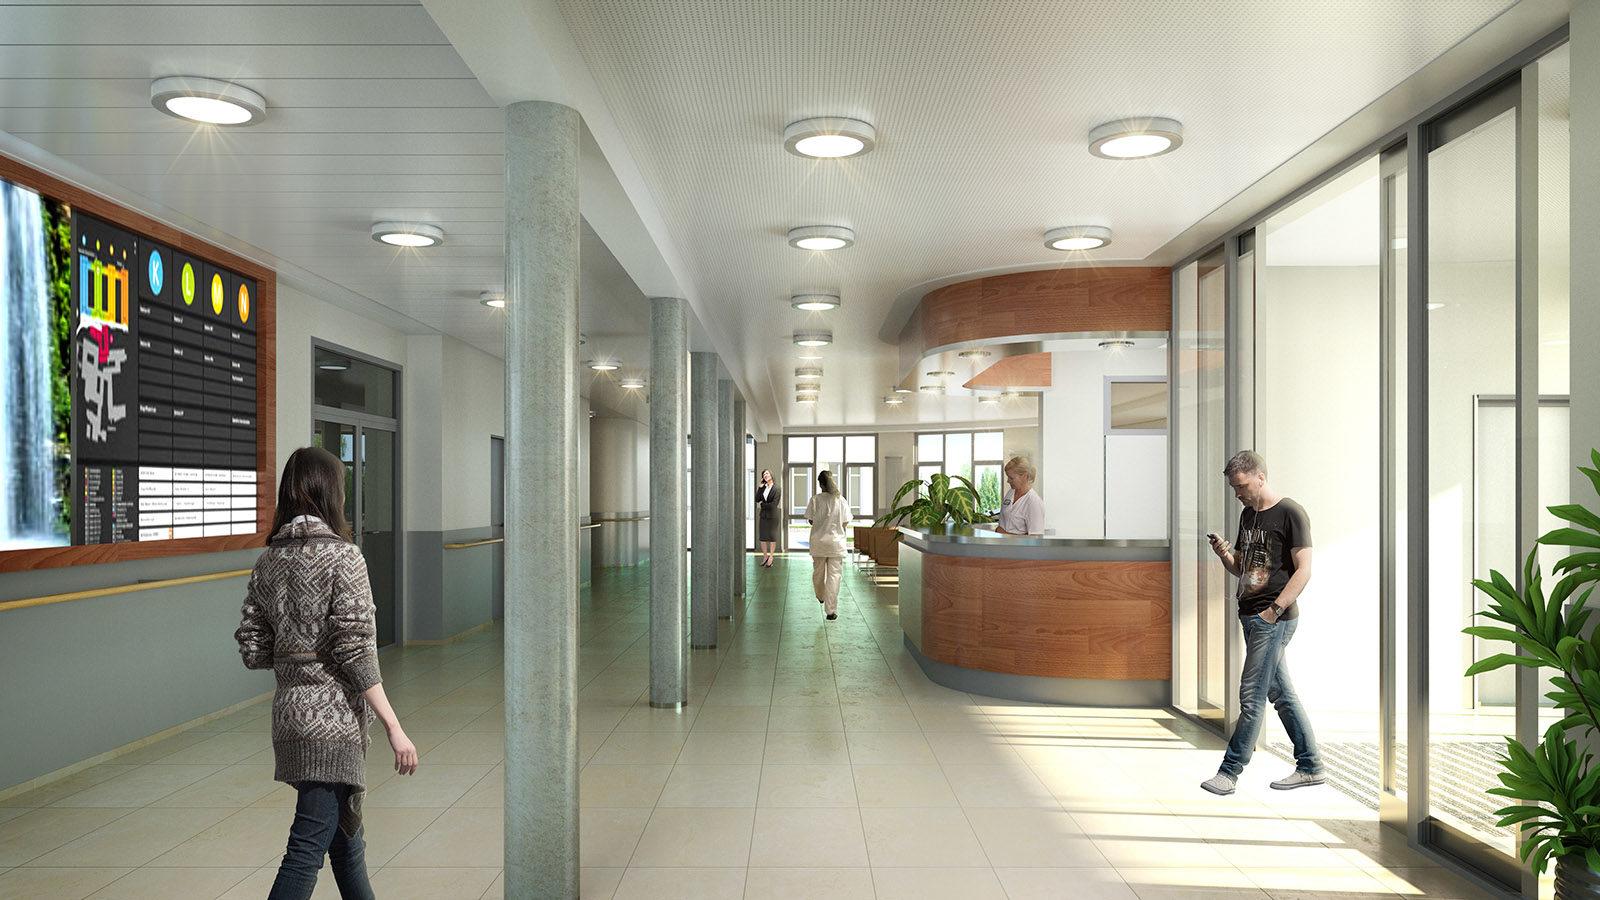 Krankenhaus Eingang - Architekturvisualisierung Innenraum